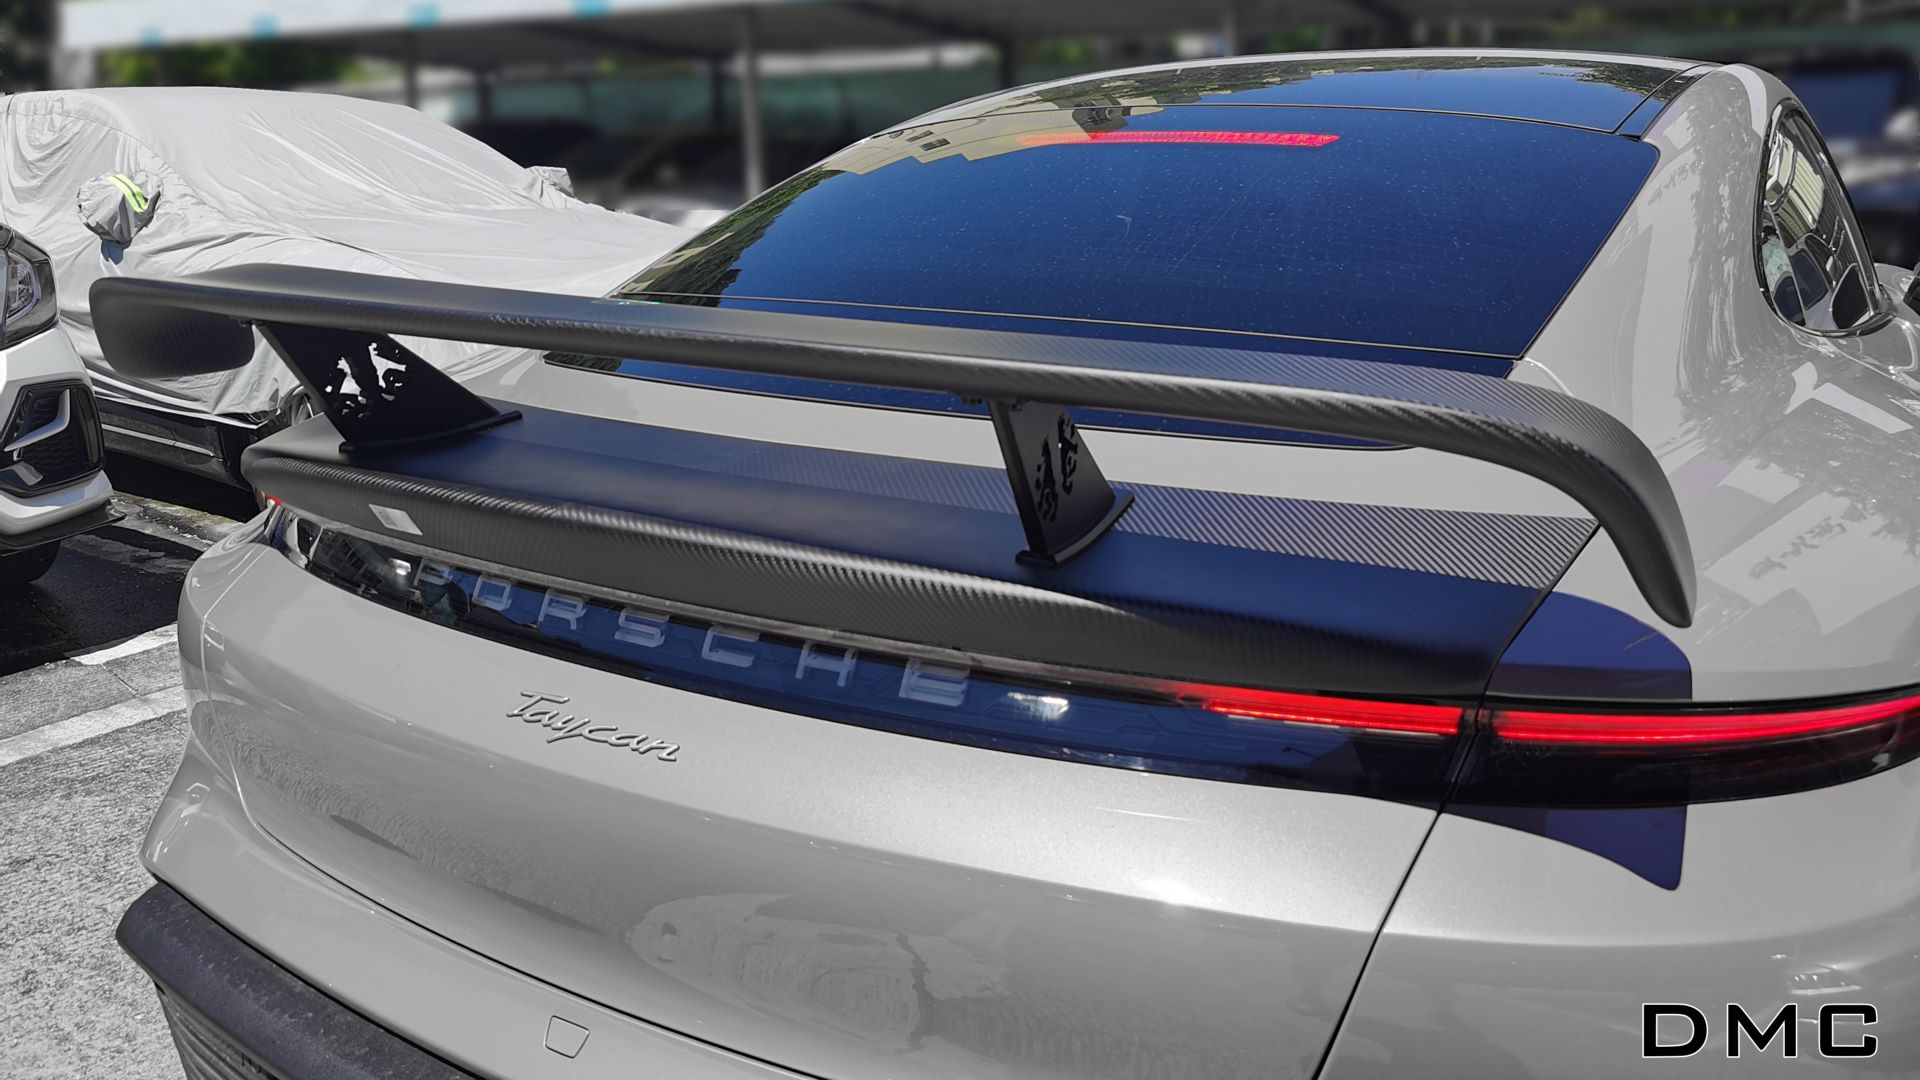 Porsche-Taycan-by-DMC-6